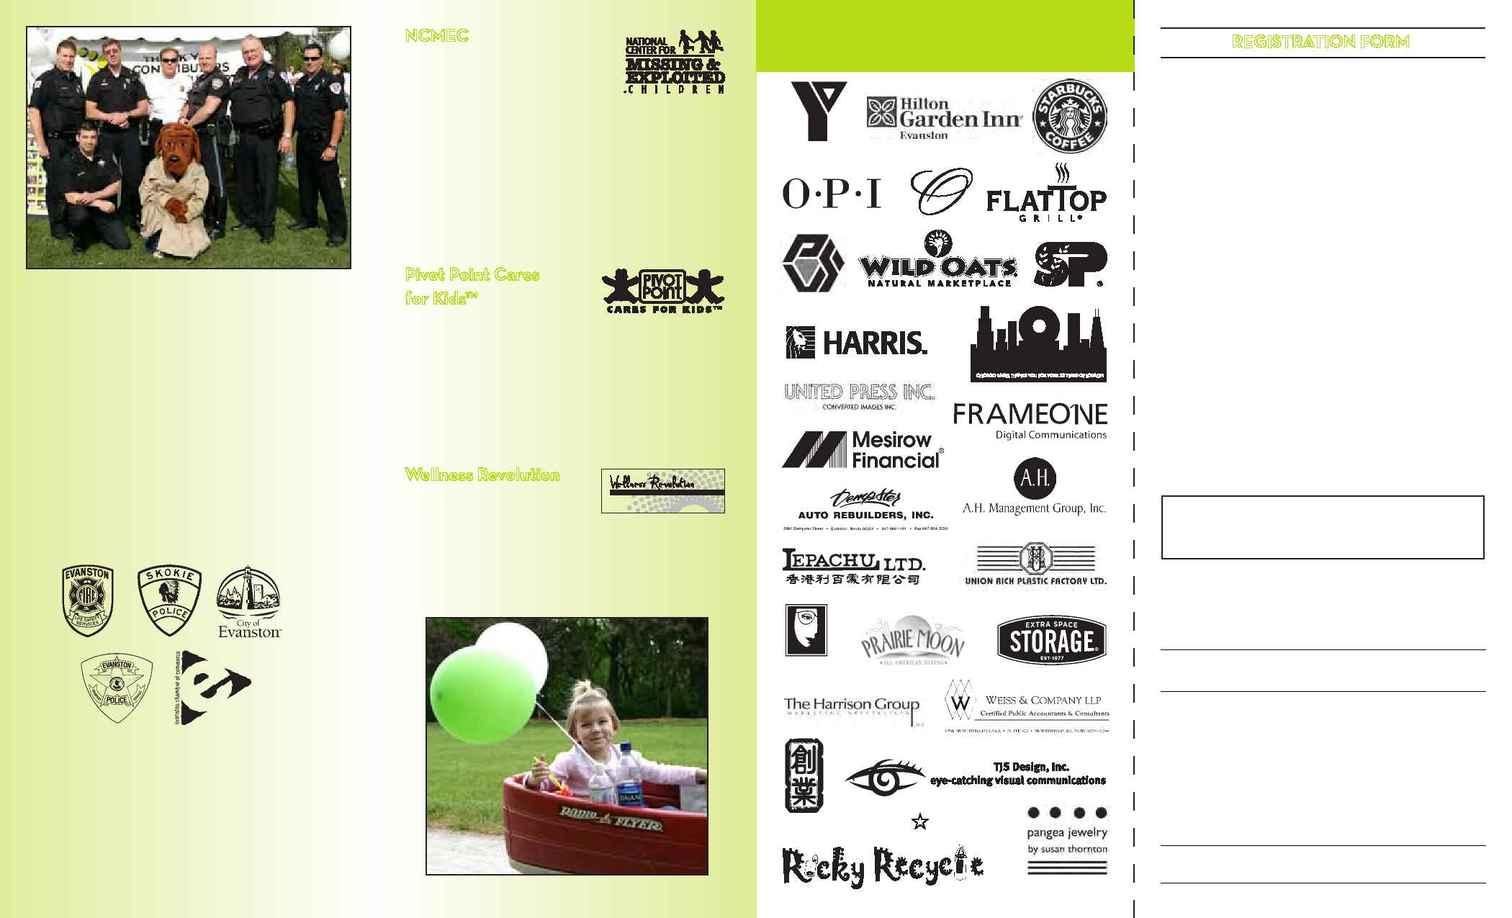 Pivot Point International, Inc. - WAT 06 brochure email